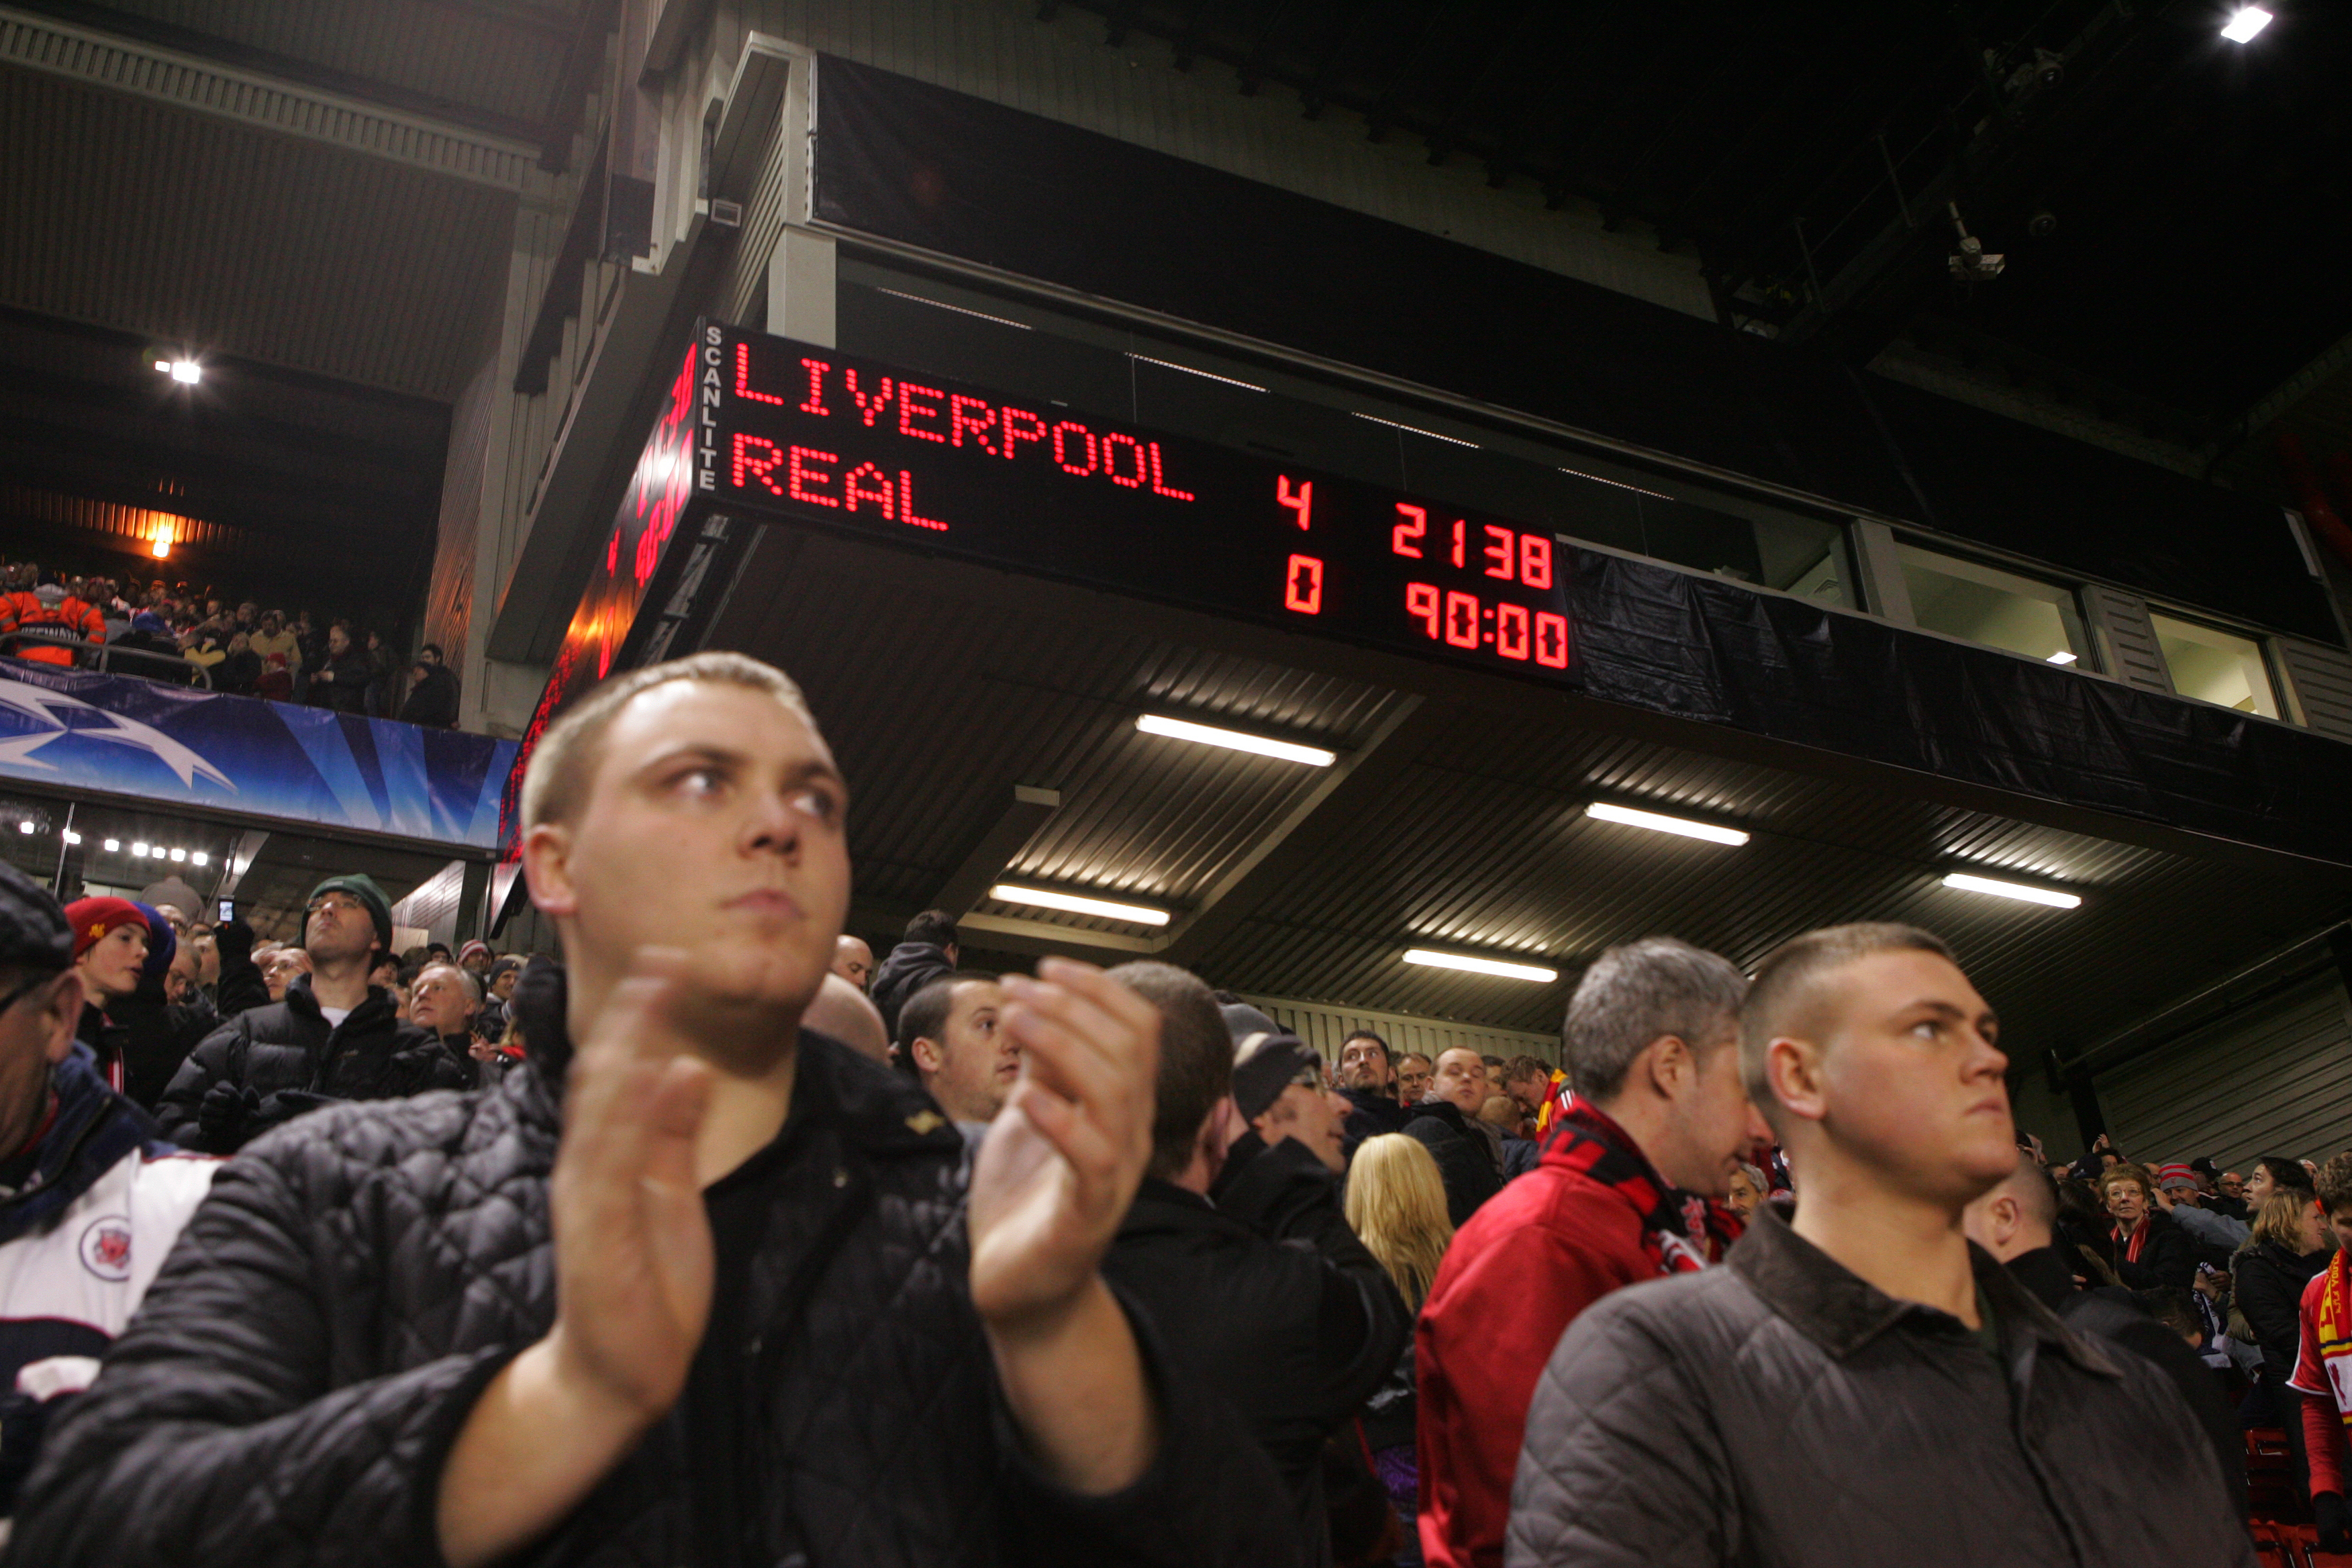 Soccer - UEFA Champions League - Liverpool vs. Real Madrid